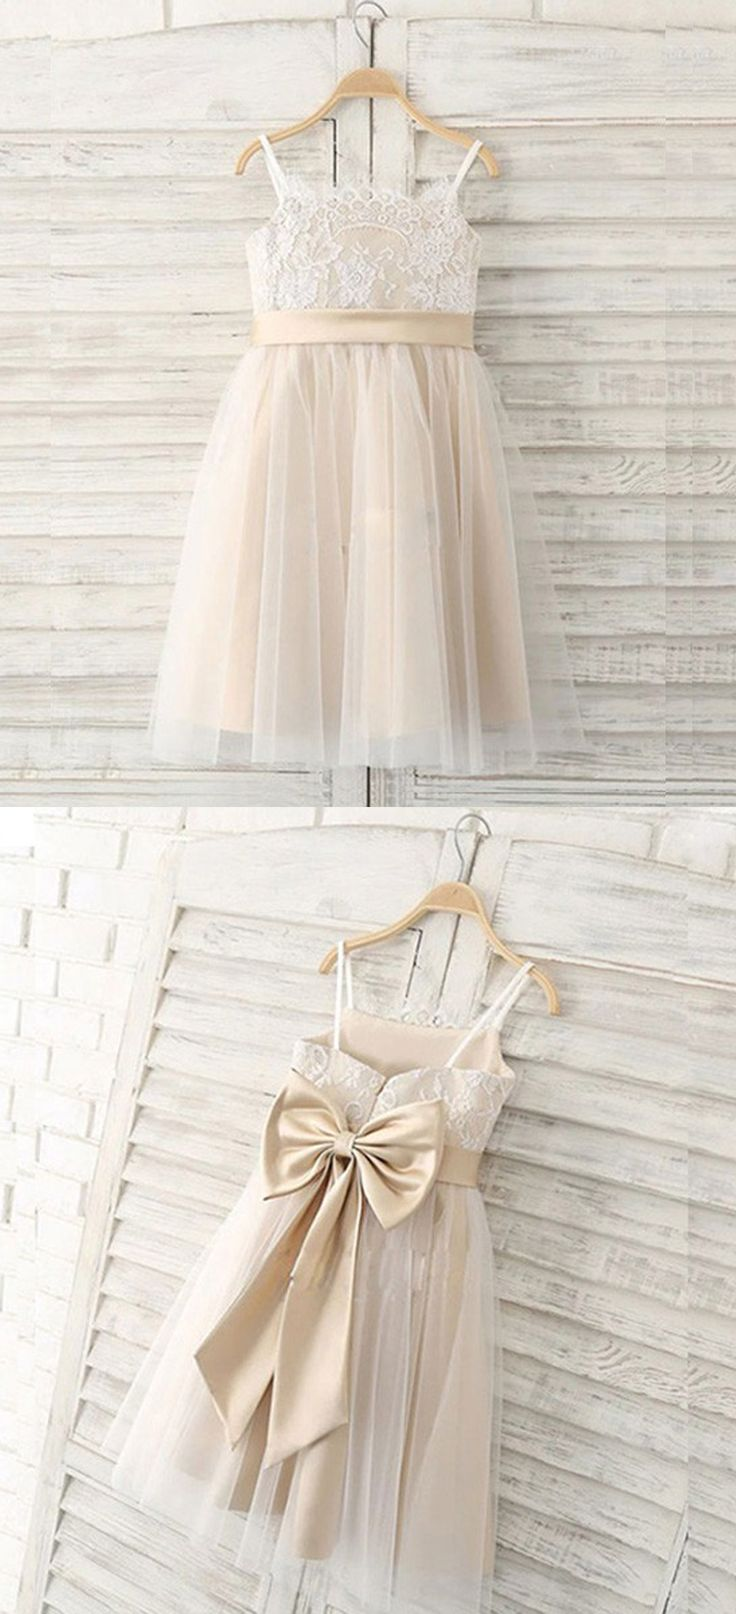 Light Champagne Flower Girl Dresses,Lace Flower Girl Dresses,Flower Girl Dresses Cute